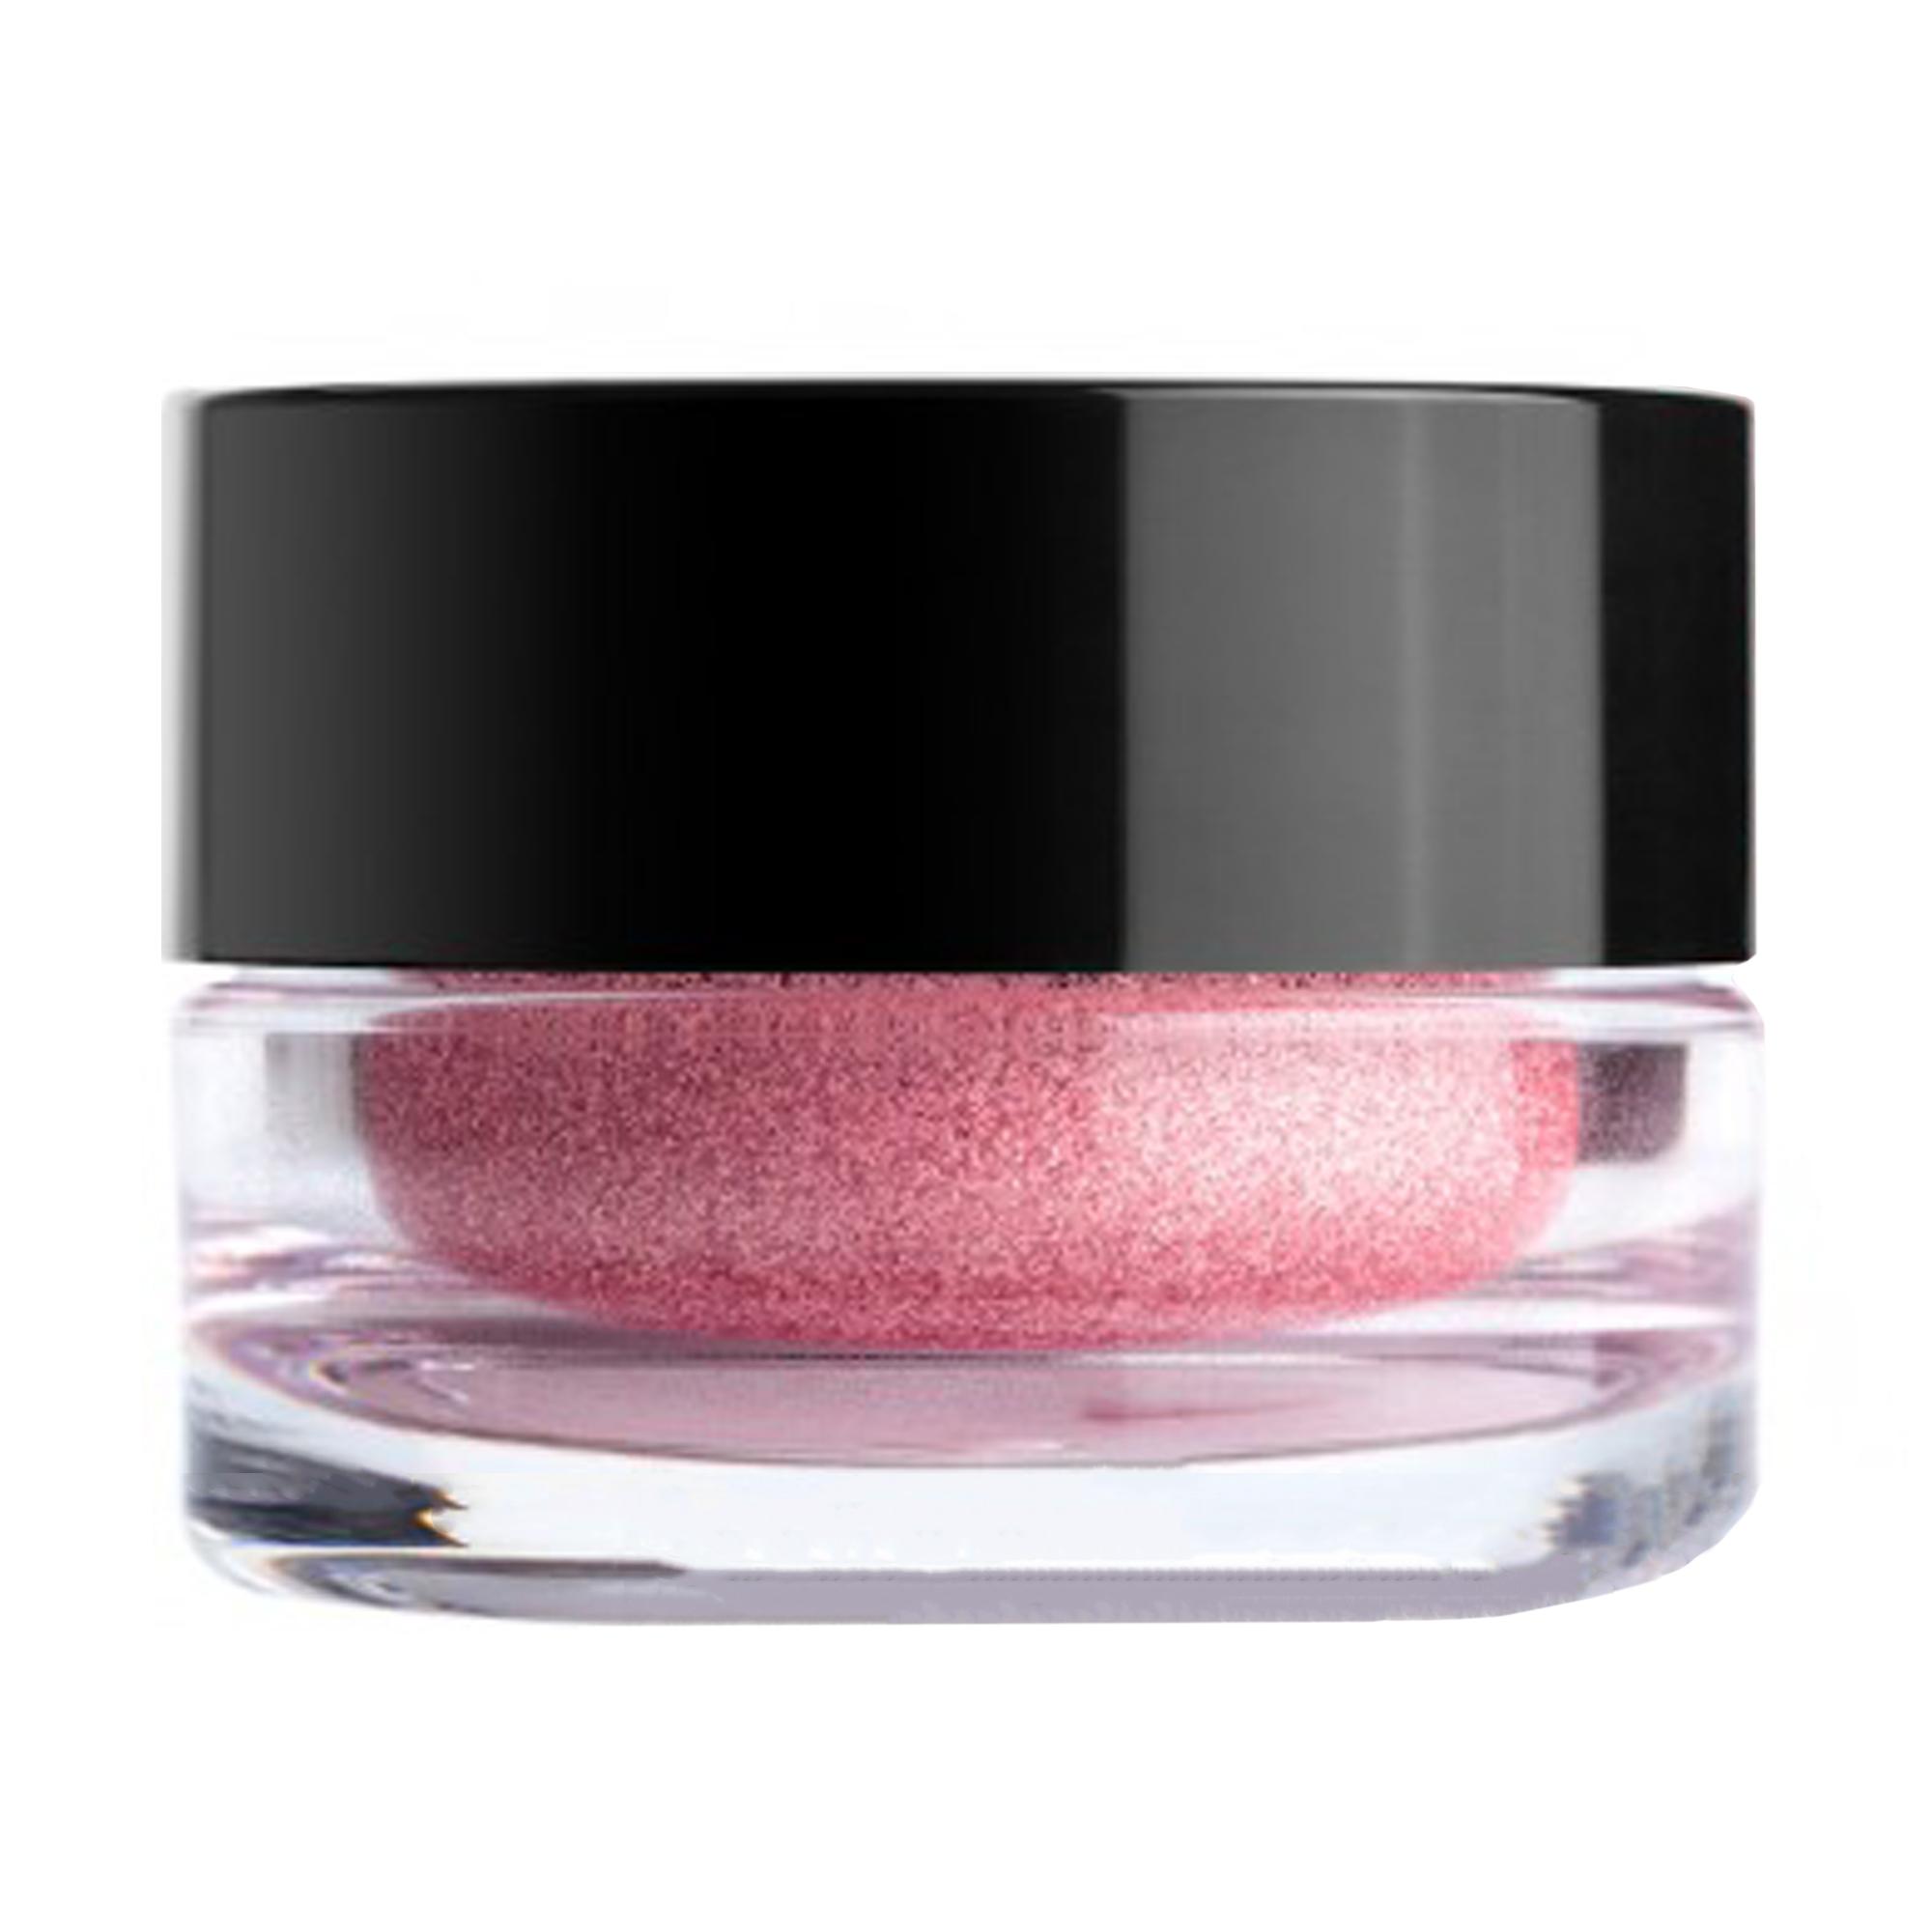 TopFace / Розсипчасті тіні для повік Topface Instyle High Pigment Loose Eyeshadow 108 Cotton Candy, 3.5 г